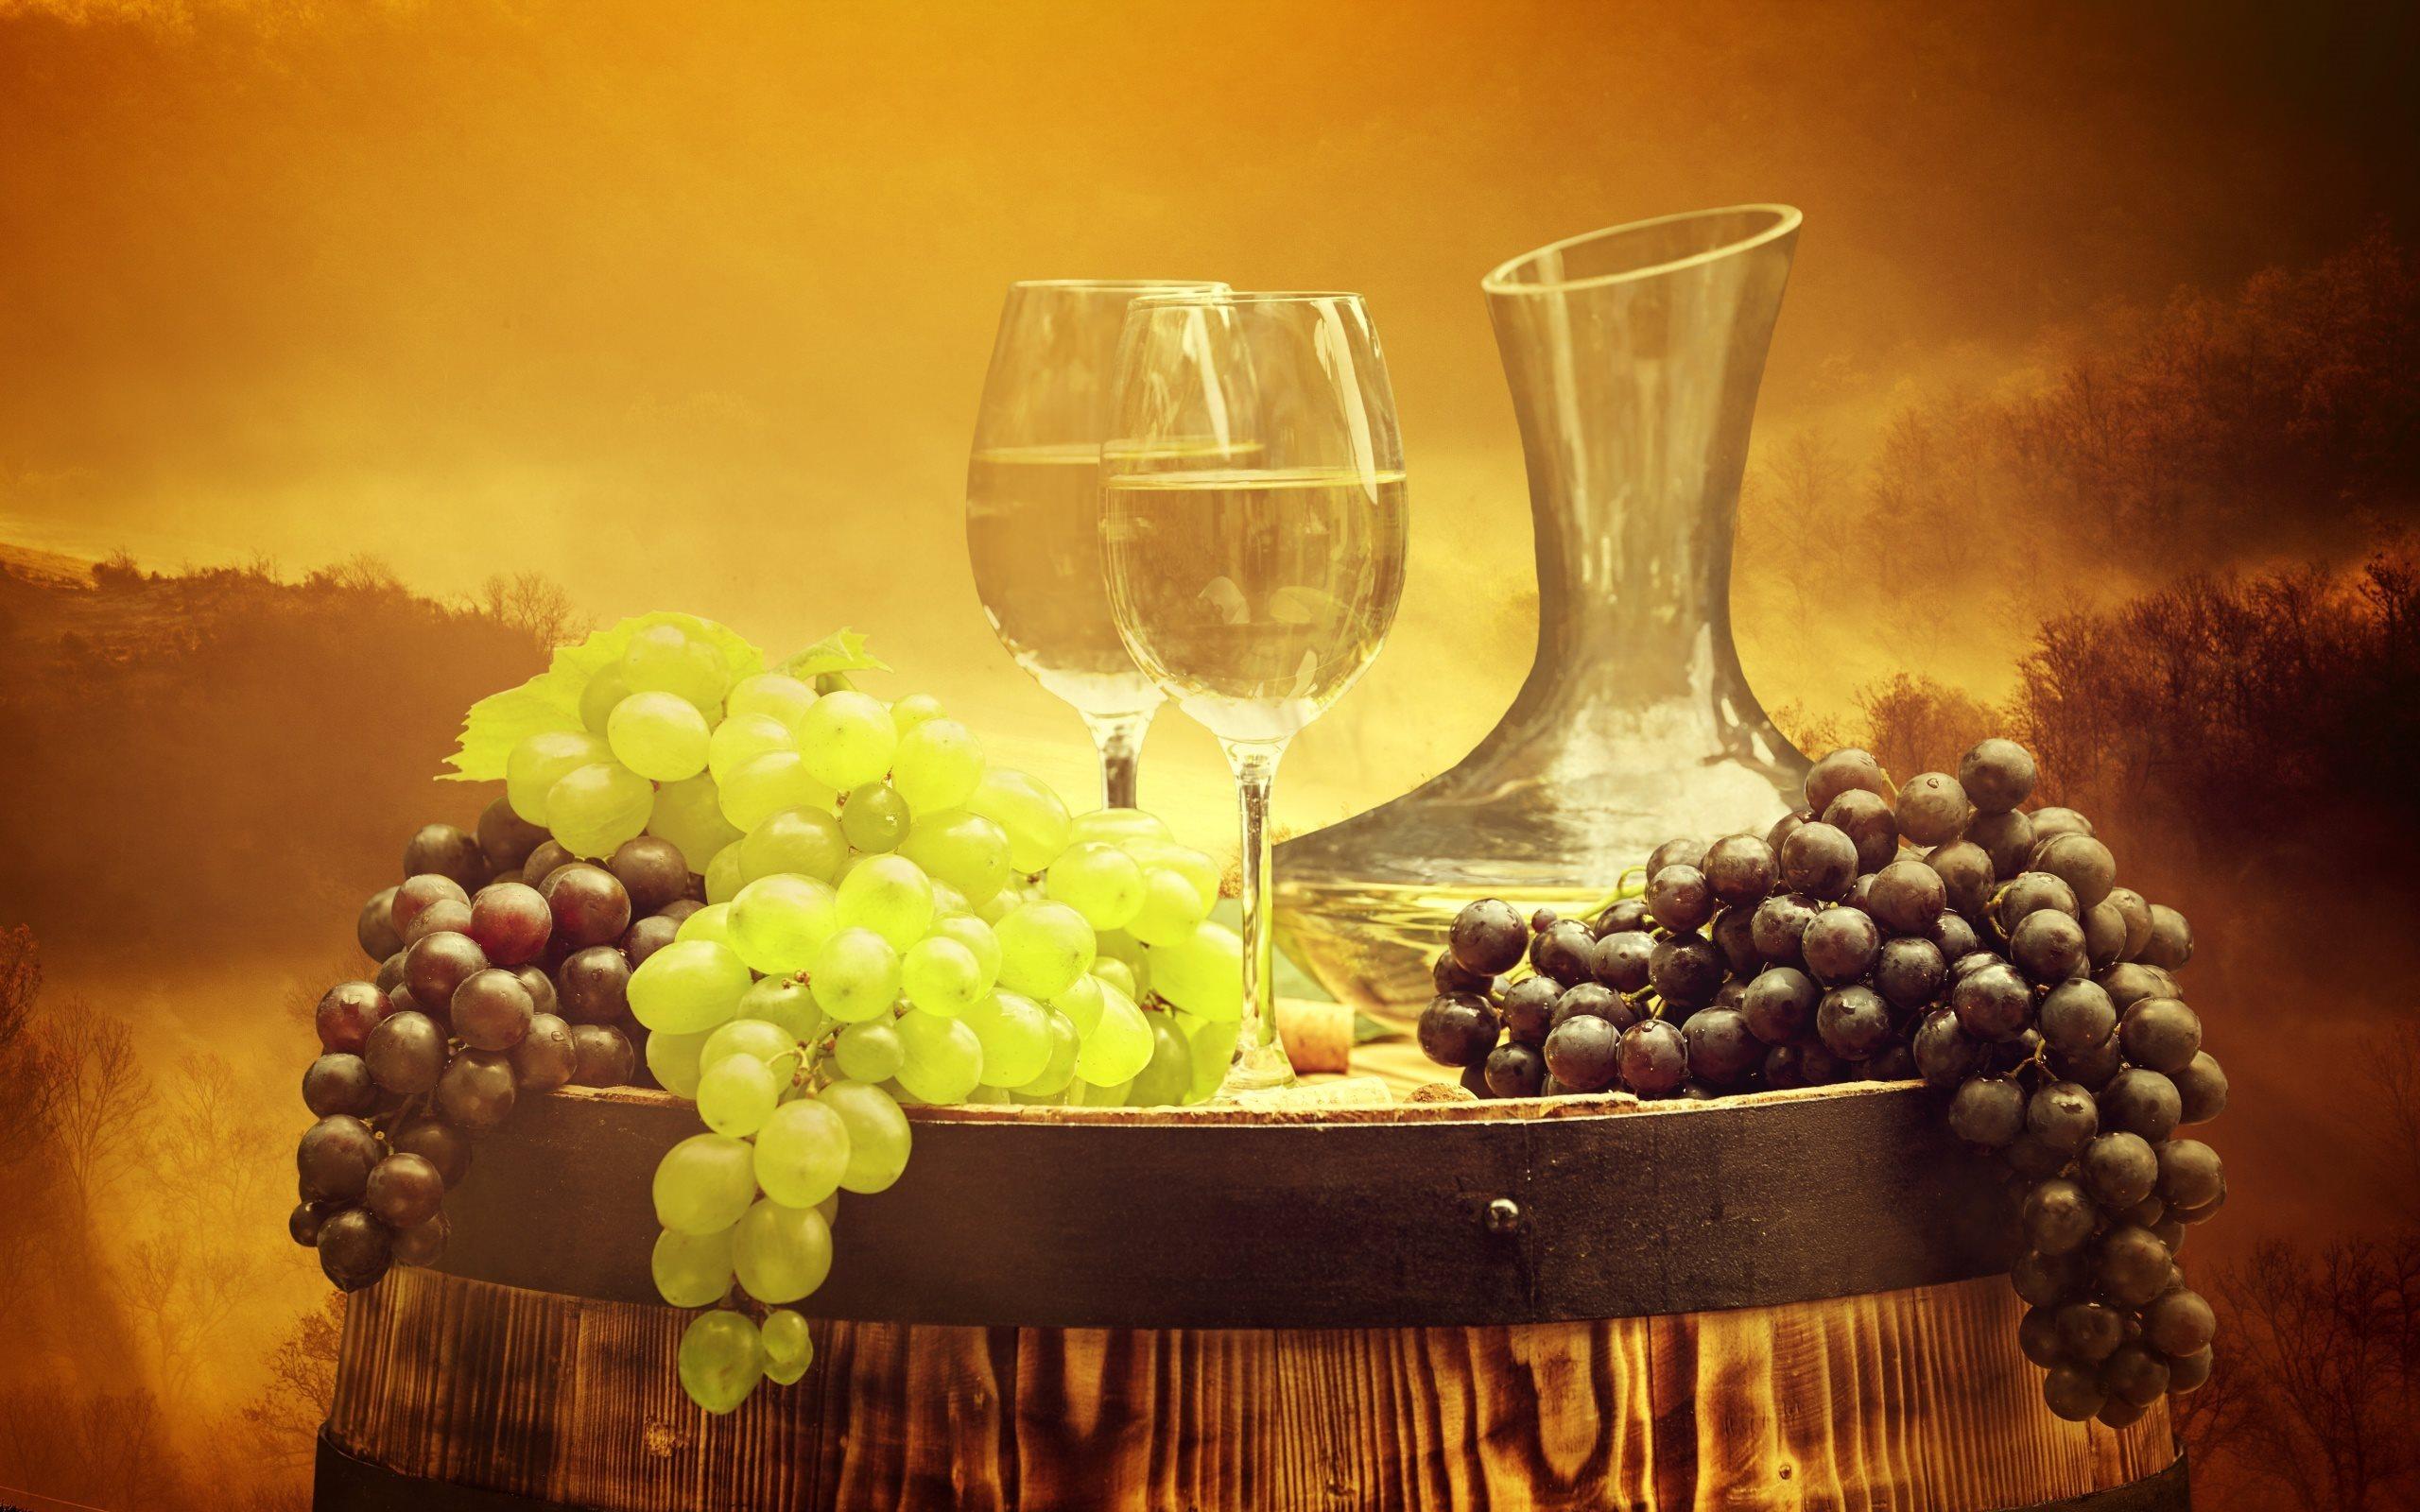 grapes-wine-wine-barrel-vintage